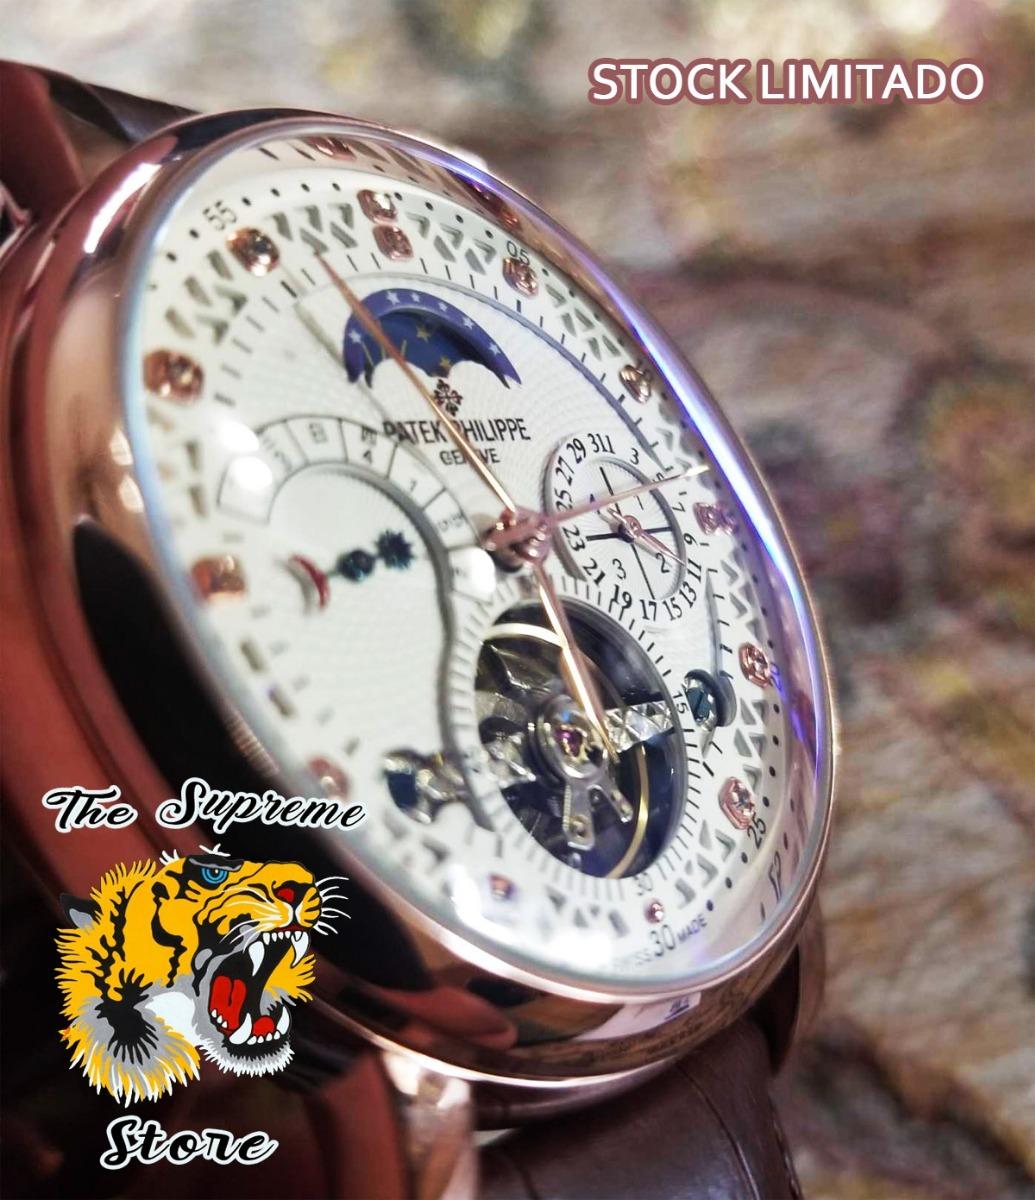 09898f08500 Cargando zoom... 2 reloj patek philippe automatico stock! fotos reales